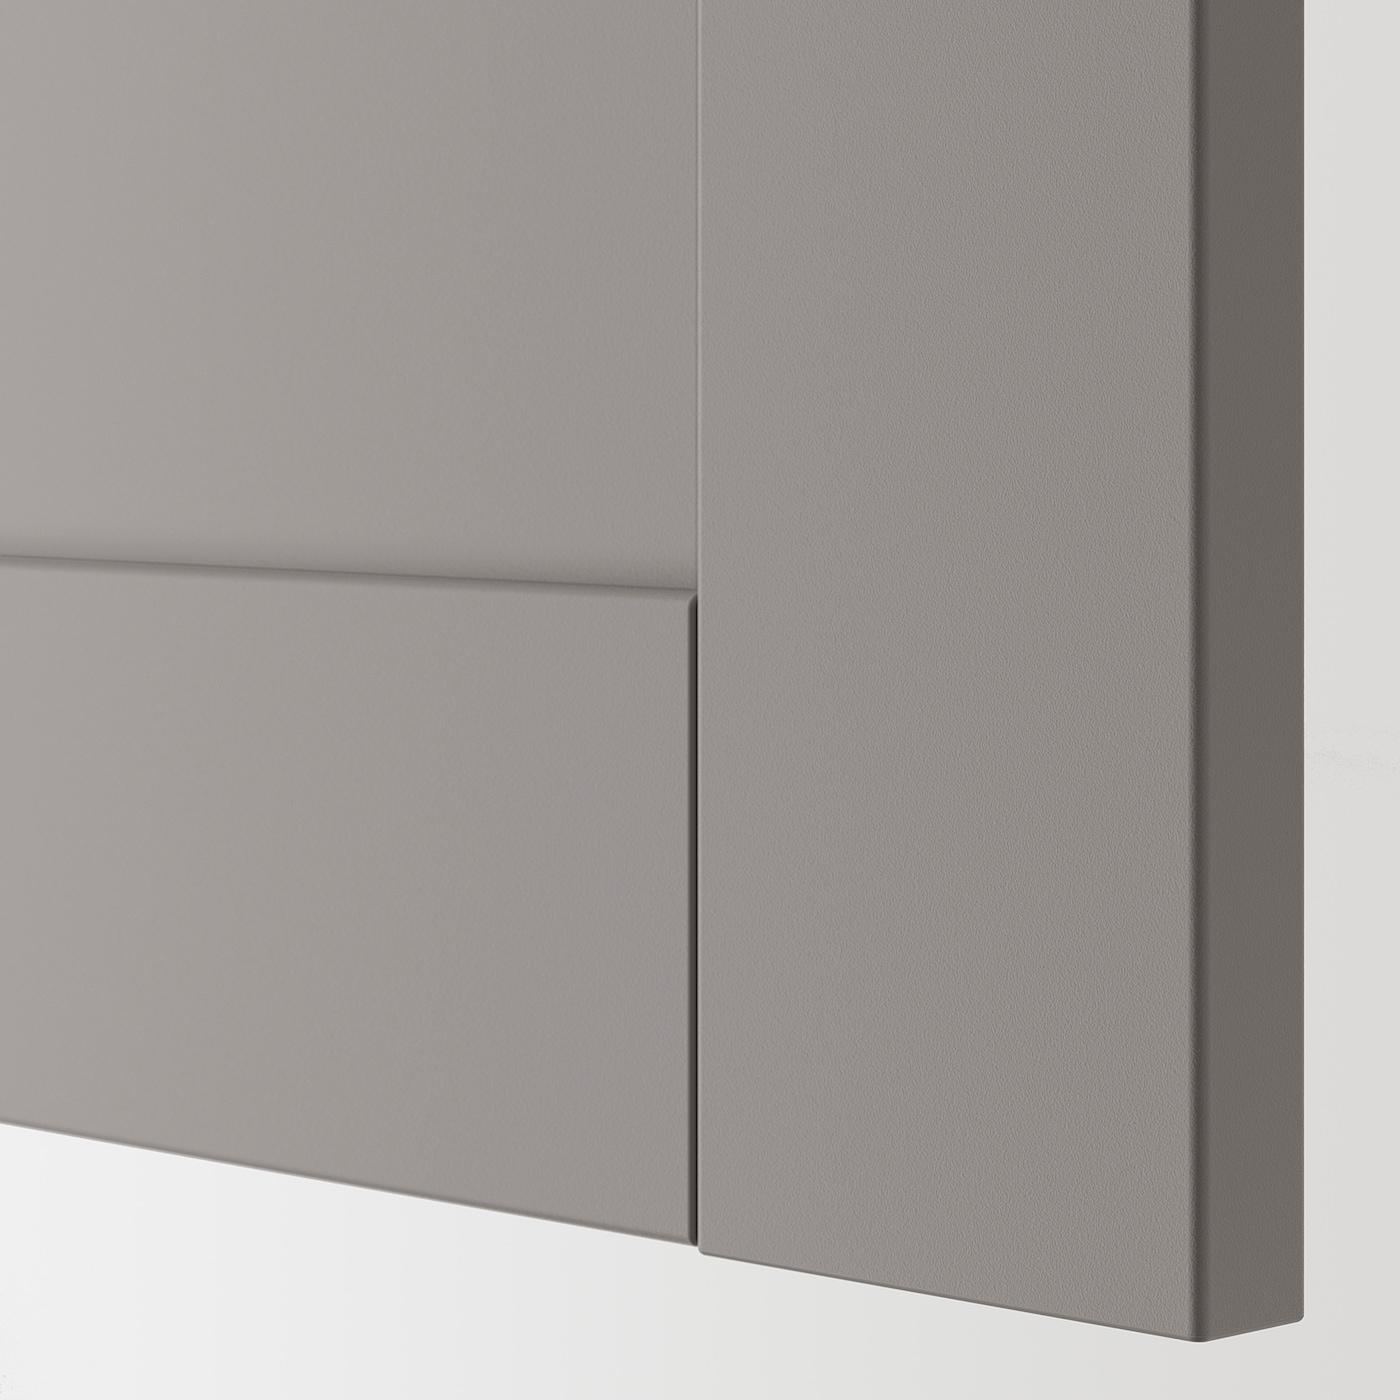 ENHET خزانة قاعدة مع رف/باب, أبيض/رمادي هيكل, 40x62x75 سم